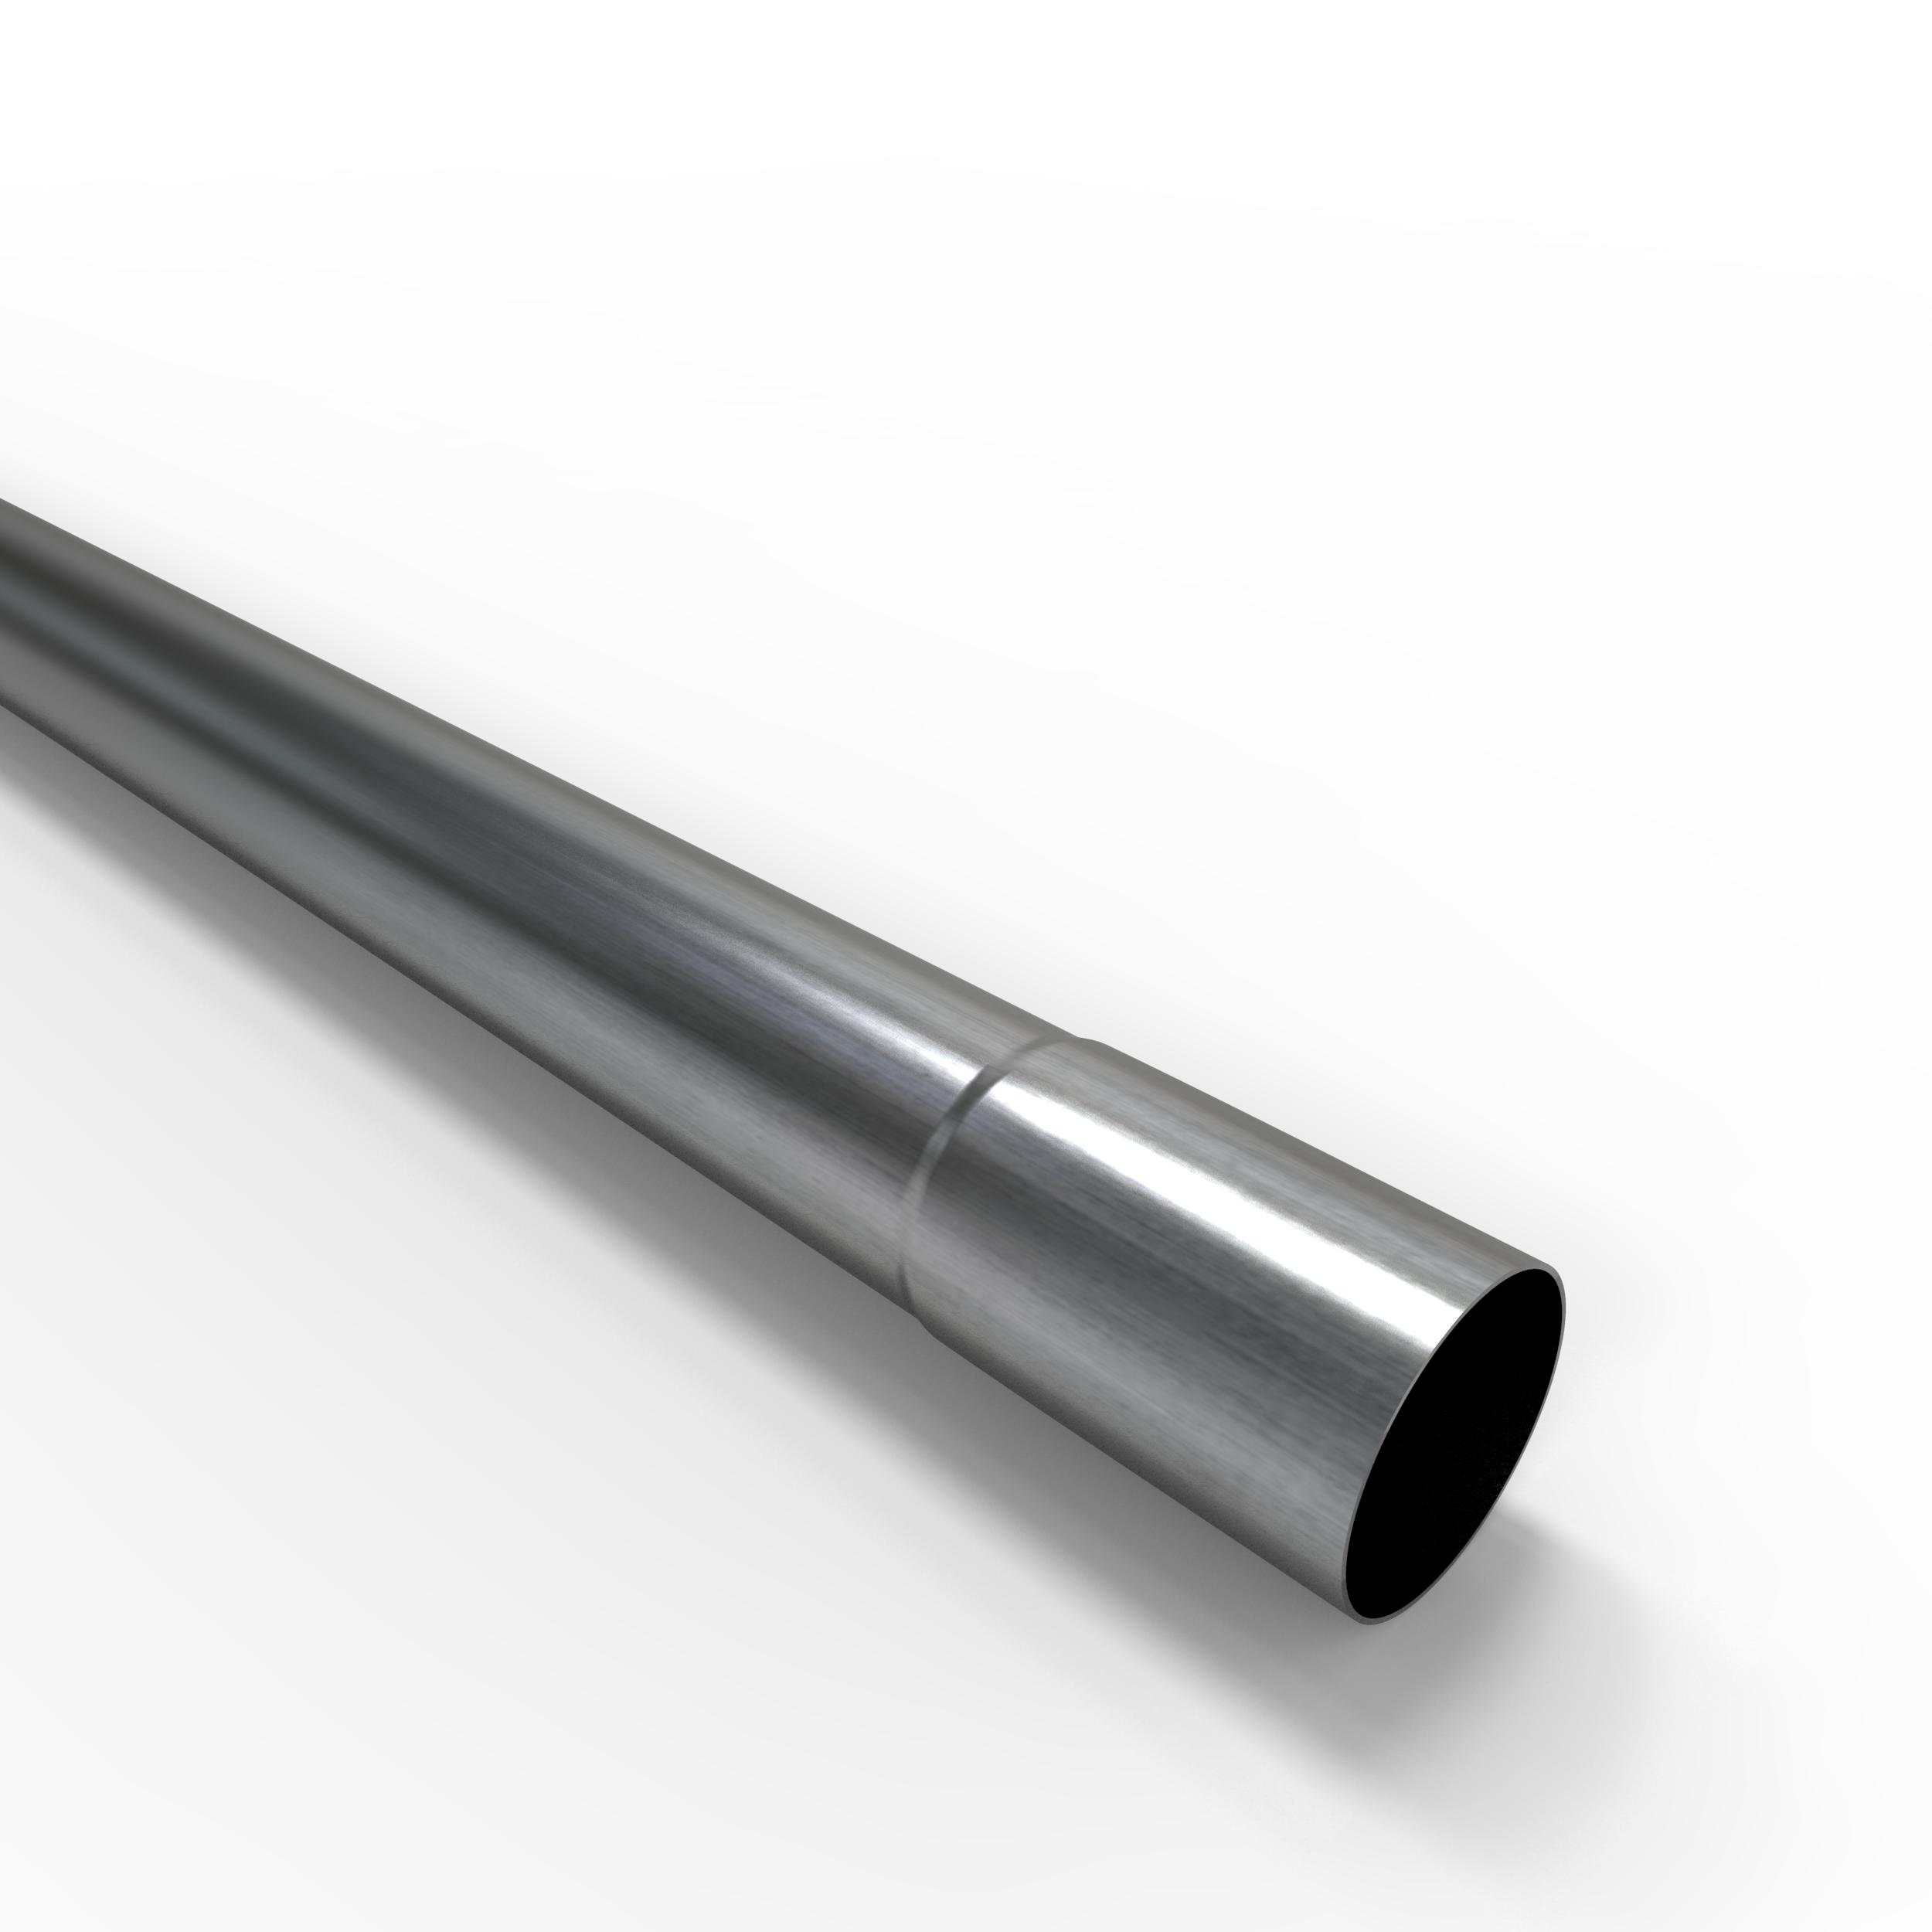 200 Stück 2,0mm Extrem Power Takkis Magnet-Plättchen 2,0mm Neu! selbstklebe